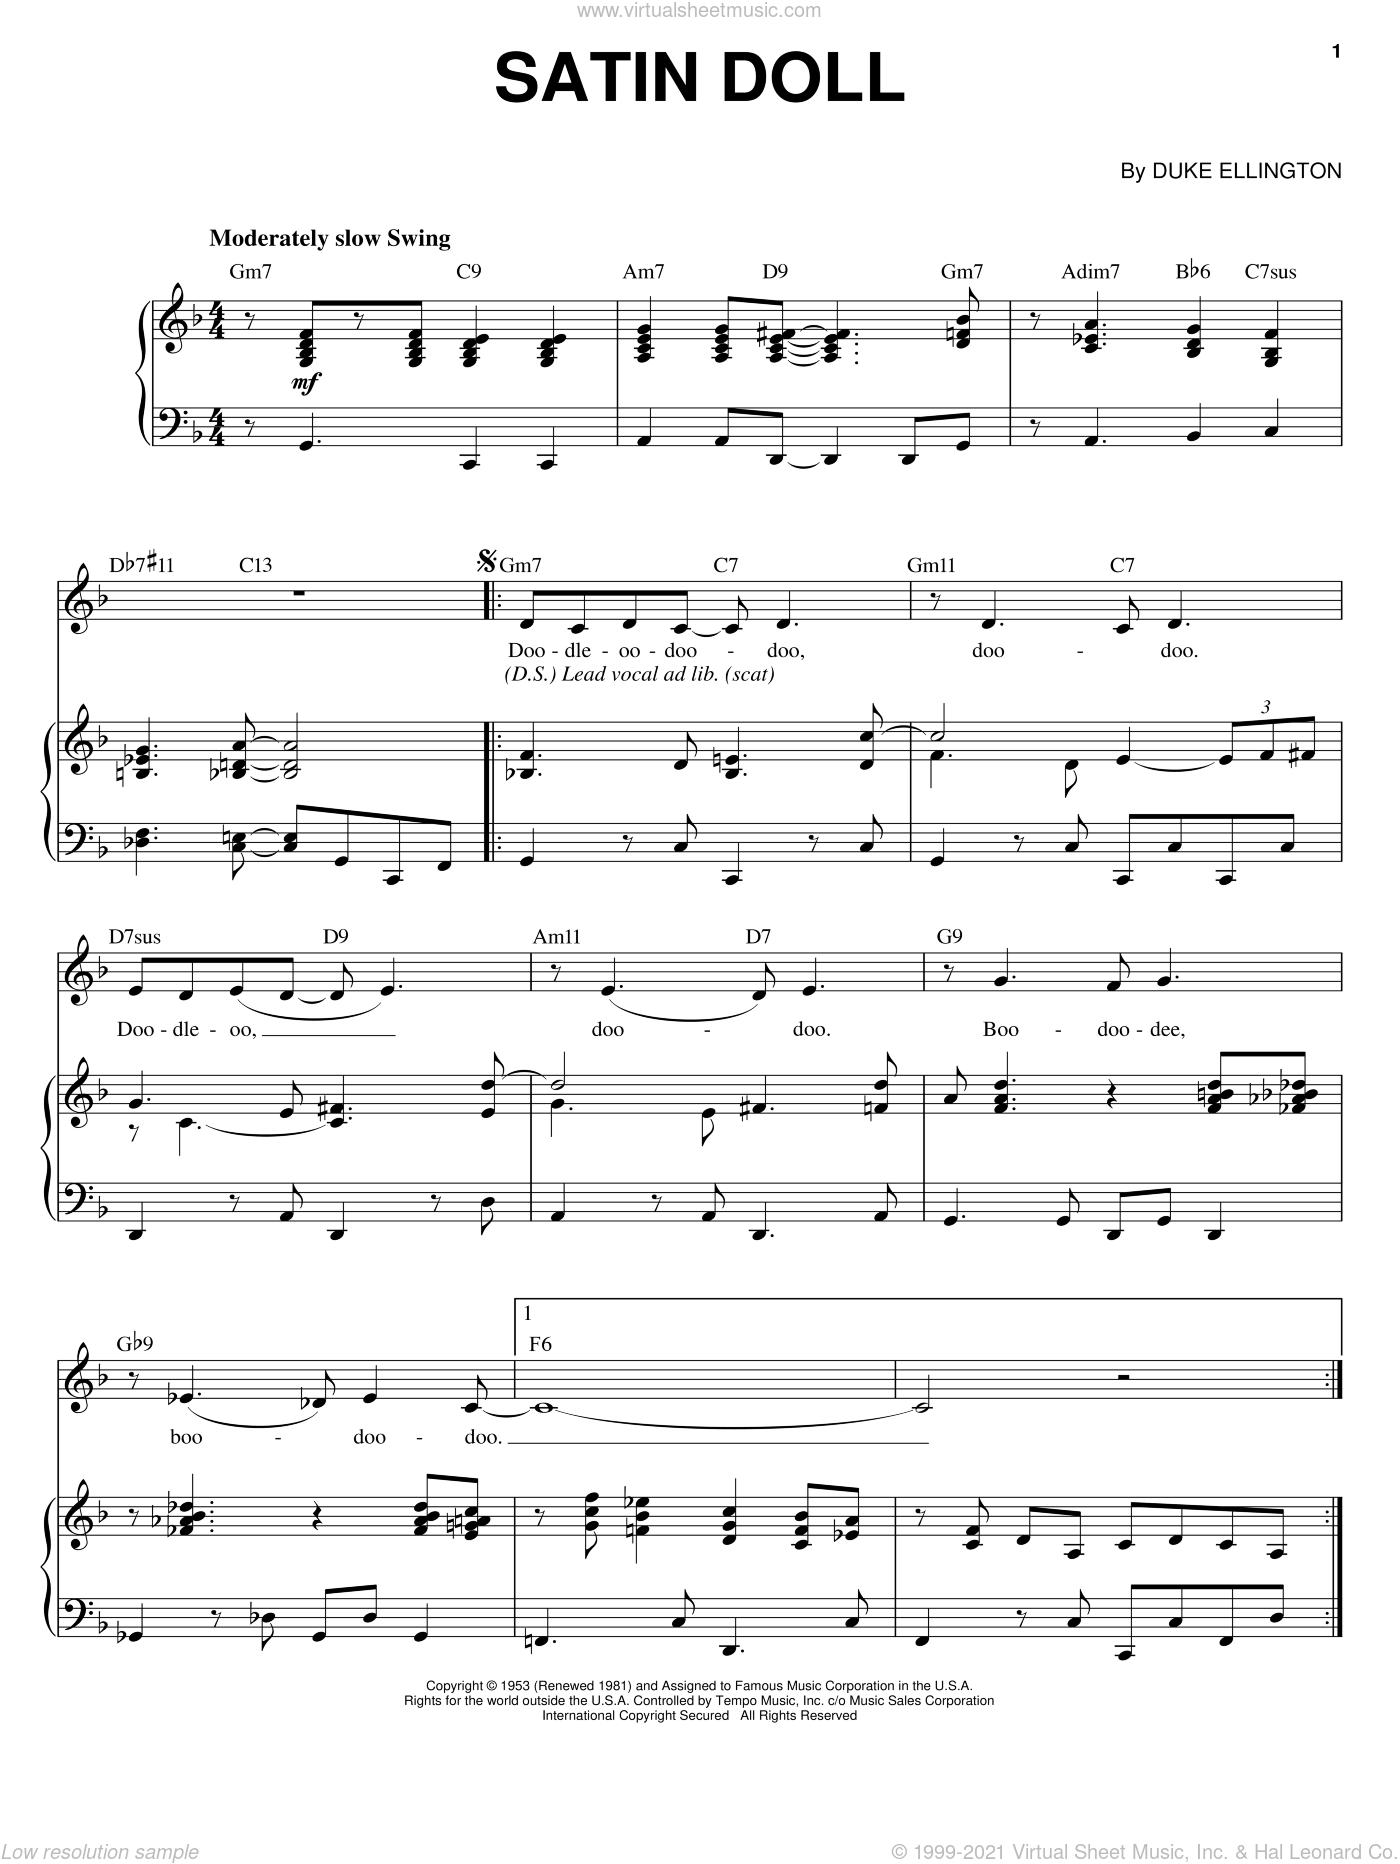 Satin Doll sheet music for voice and piano by Ella Fitzgerald, Billy Strayhorn, Duke Ellington and Johnny Mercer, intermediate skill level